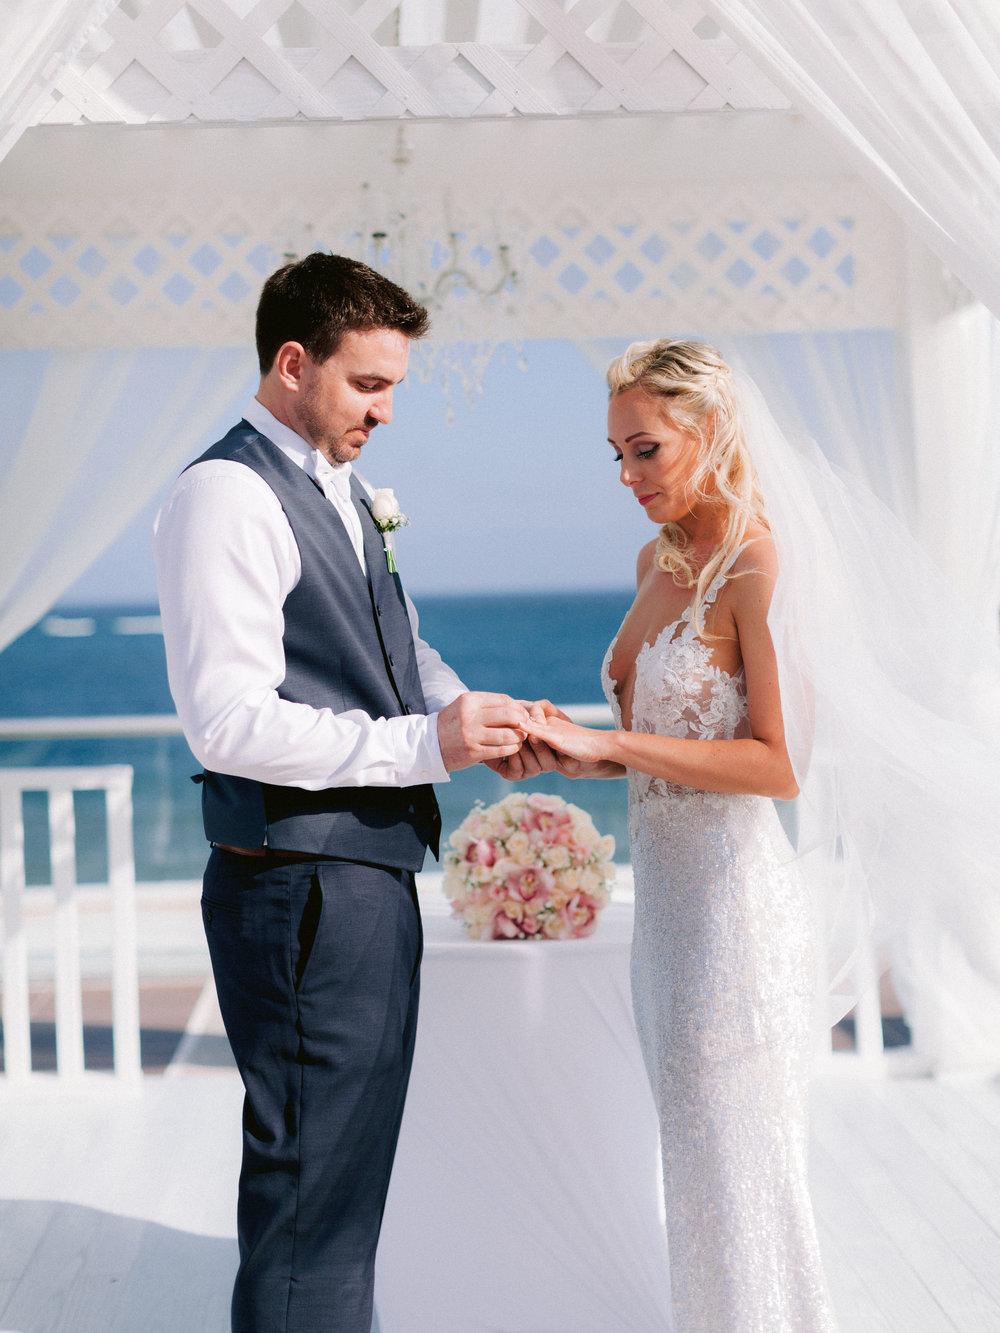 Kim_Jeff_Cancun Wedding_Ceremony_Kurtz_Orpia (69 of 119).jpg